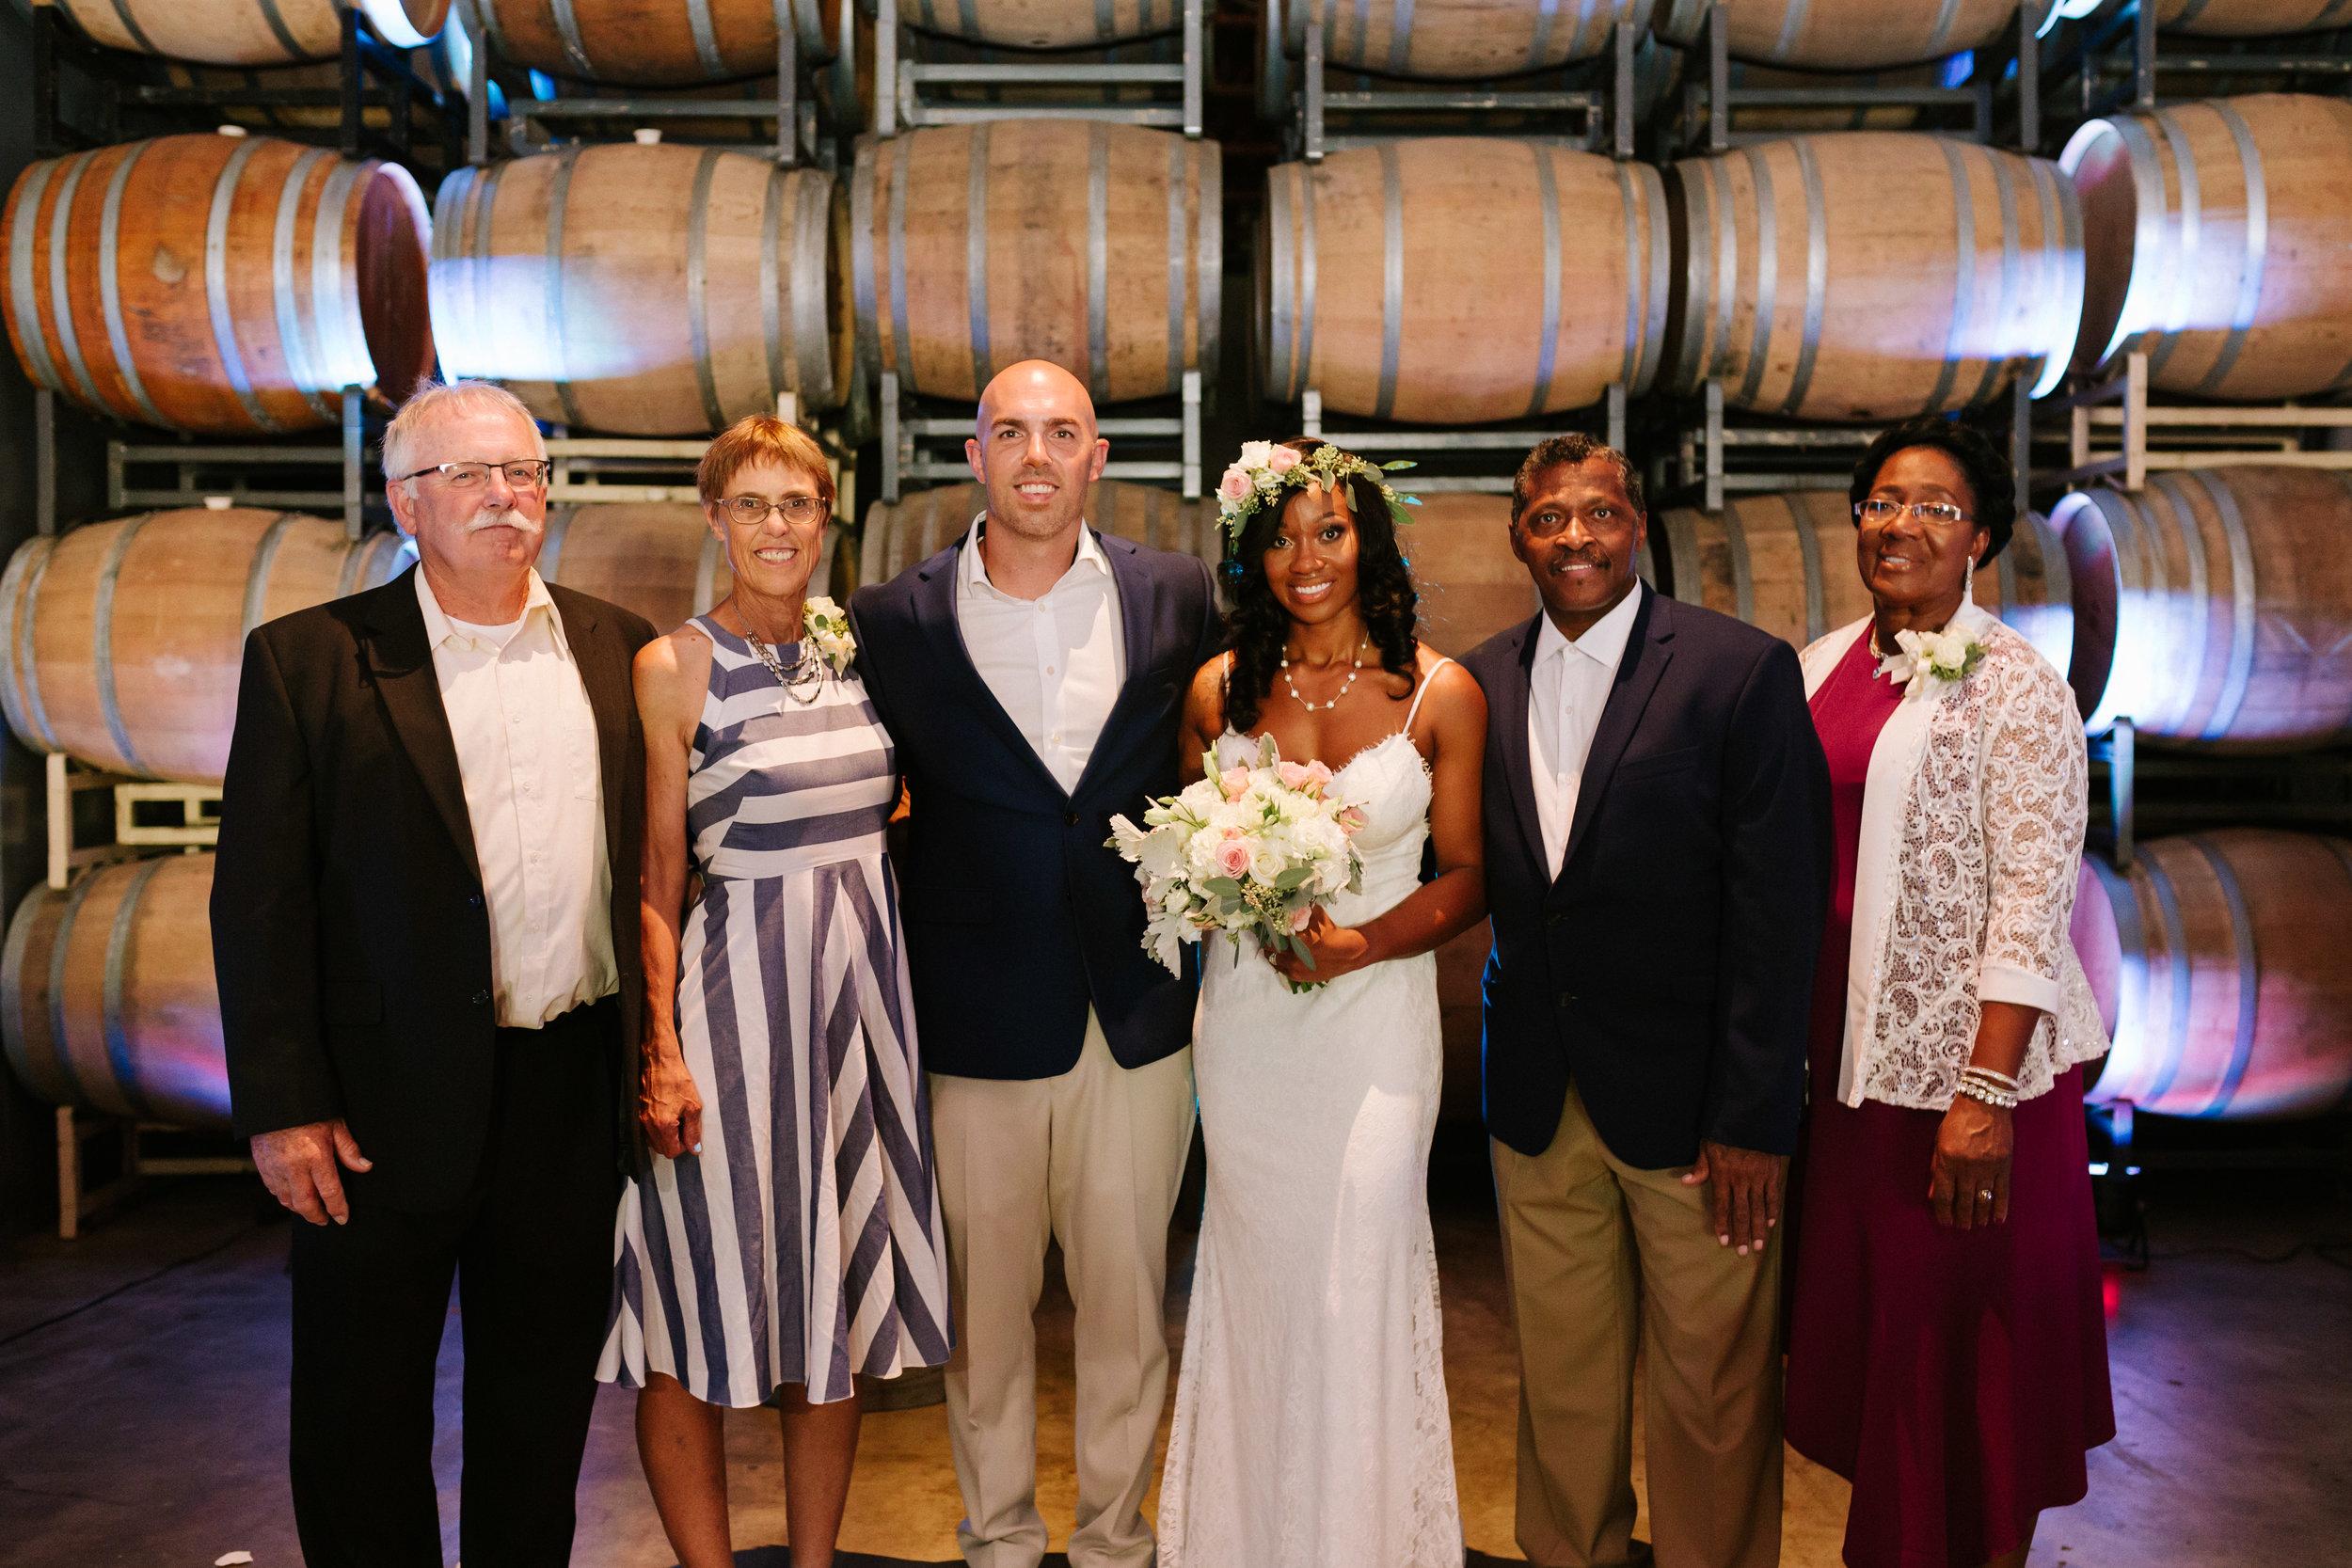 2017.09.16 Ashley and Chuck O'Day Quantam Leap Winery Wedding (201 of 462).jpg